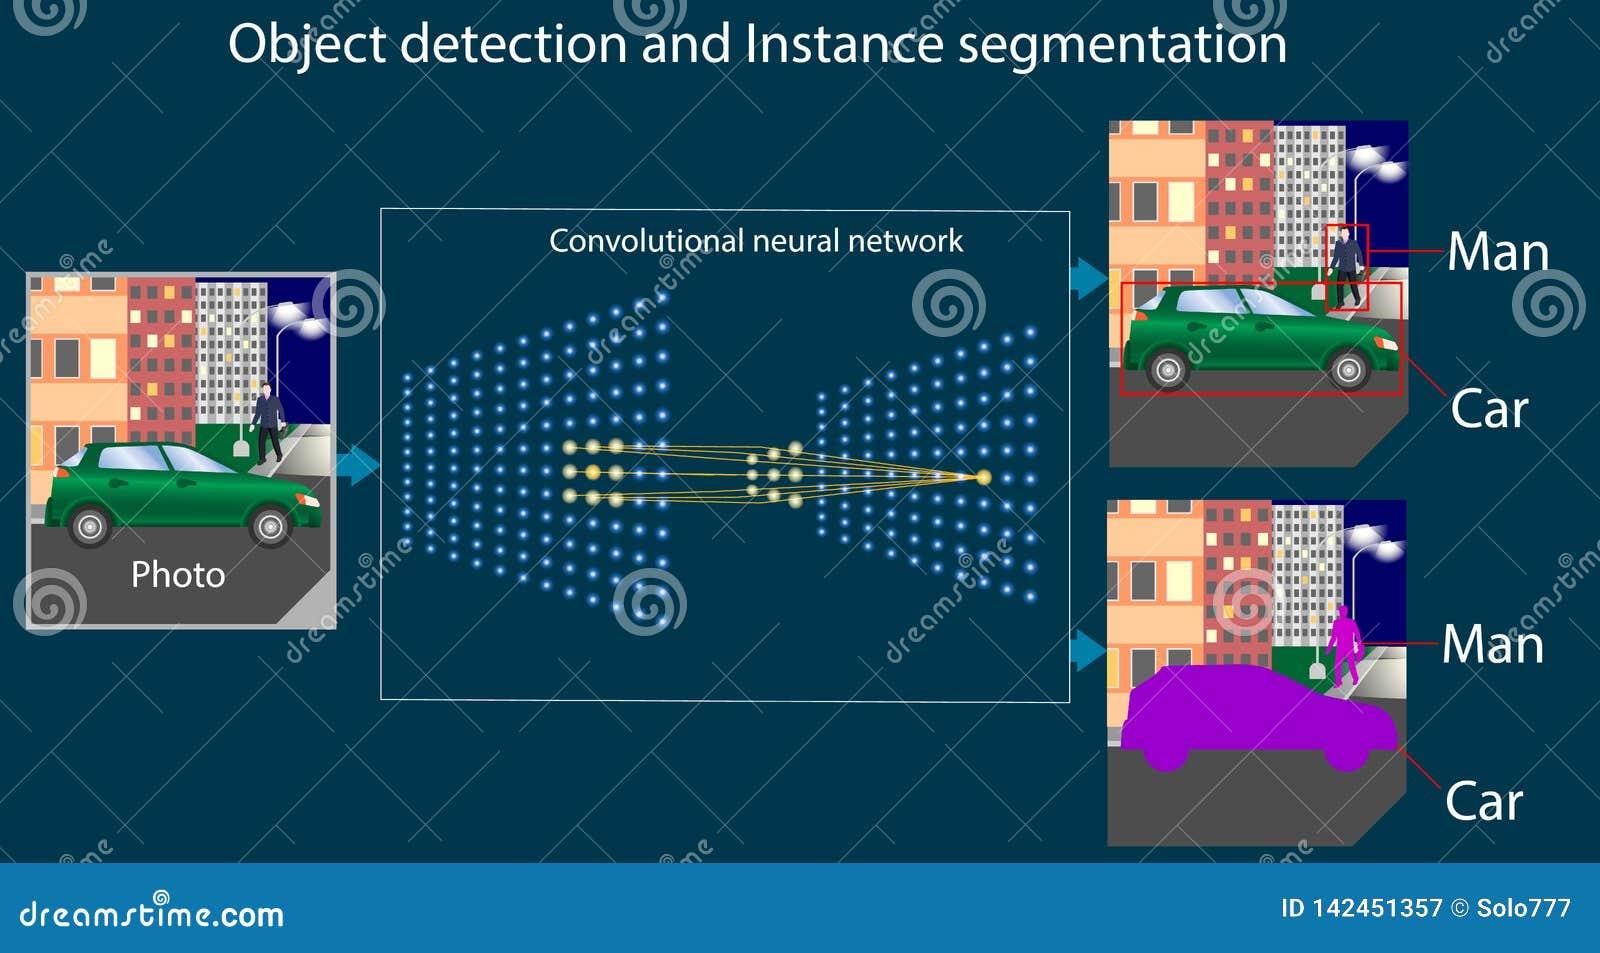 Convolutional Neural Network Work Scheme - Object Detection